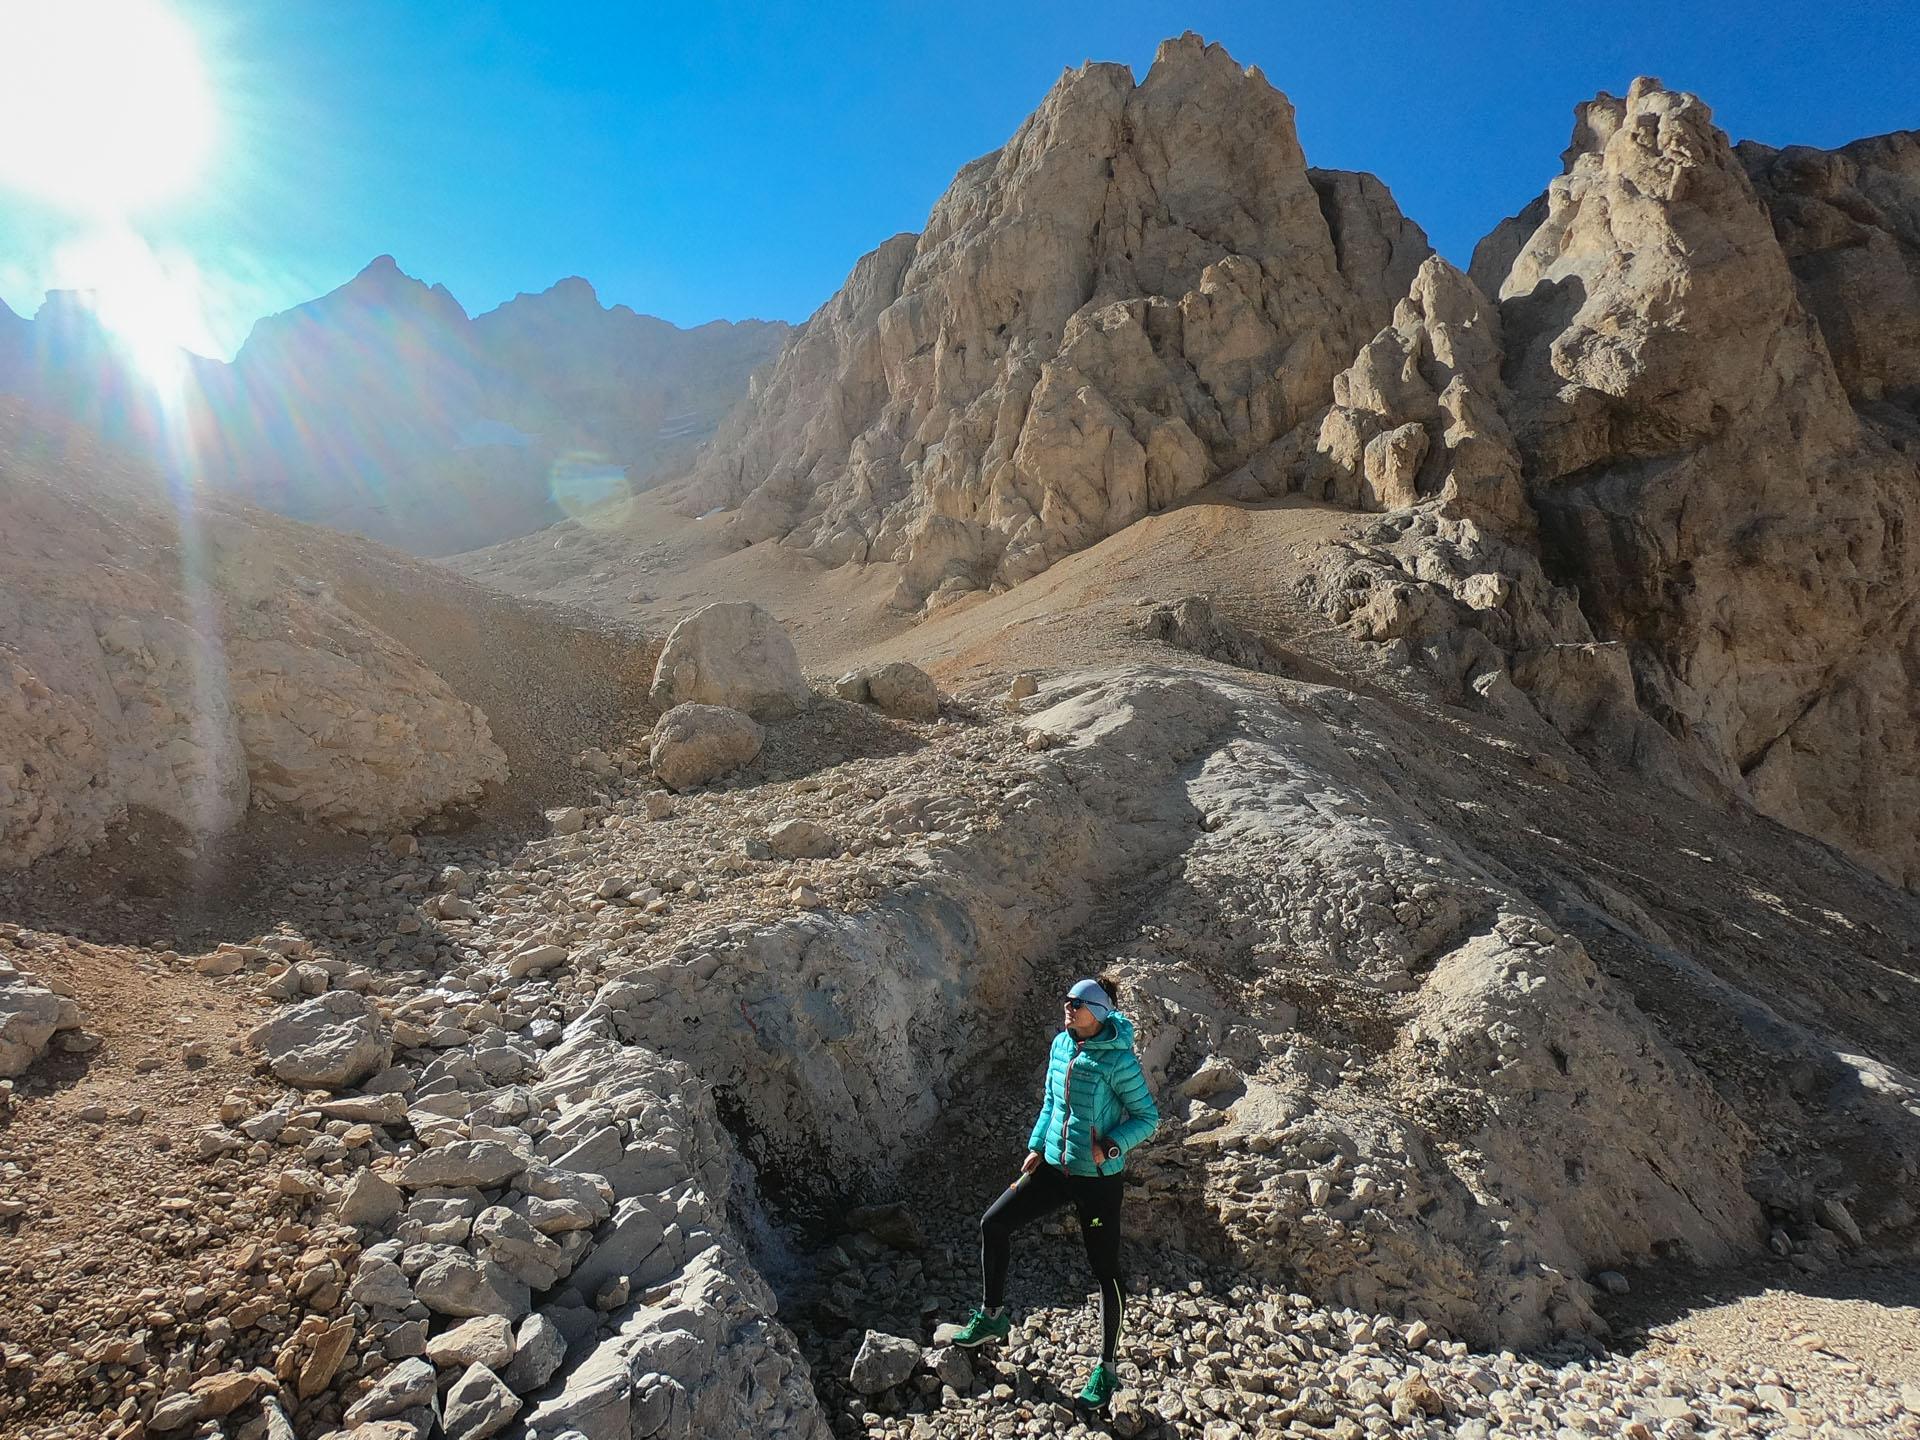 Celikbuyduran 3350 m n.p.m. Aladağlar National Park, Turcja